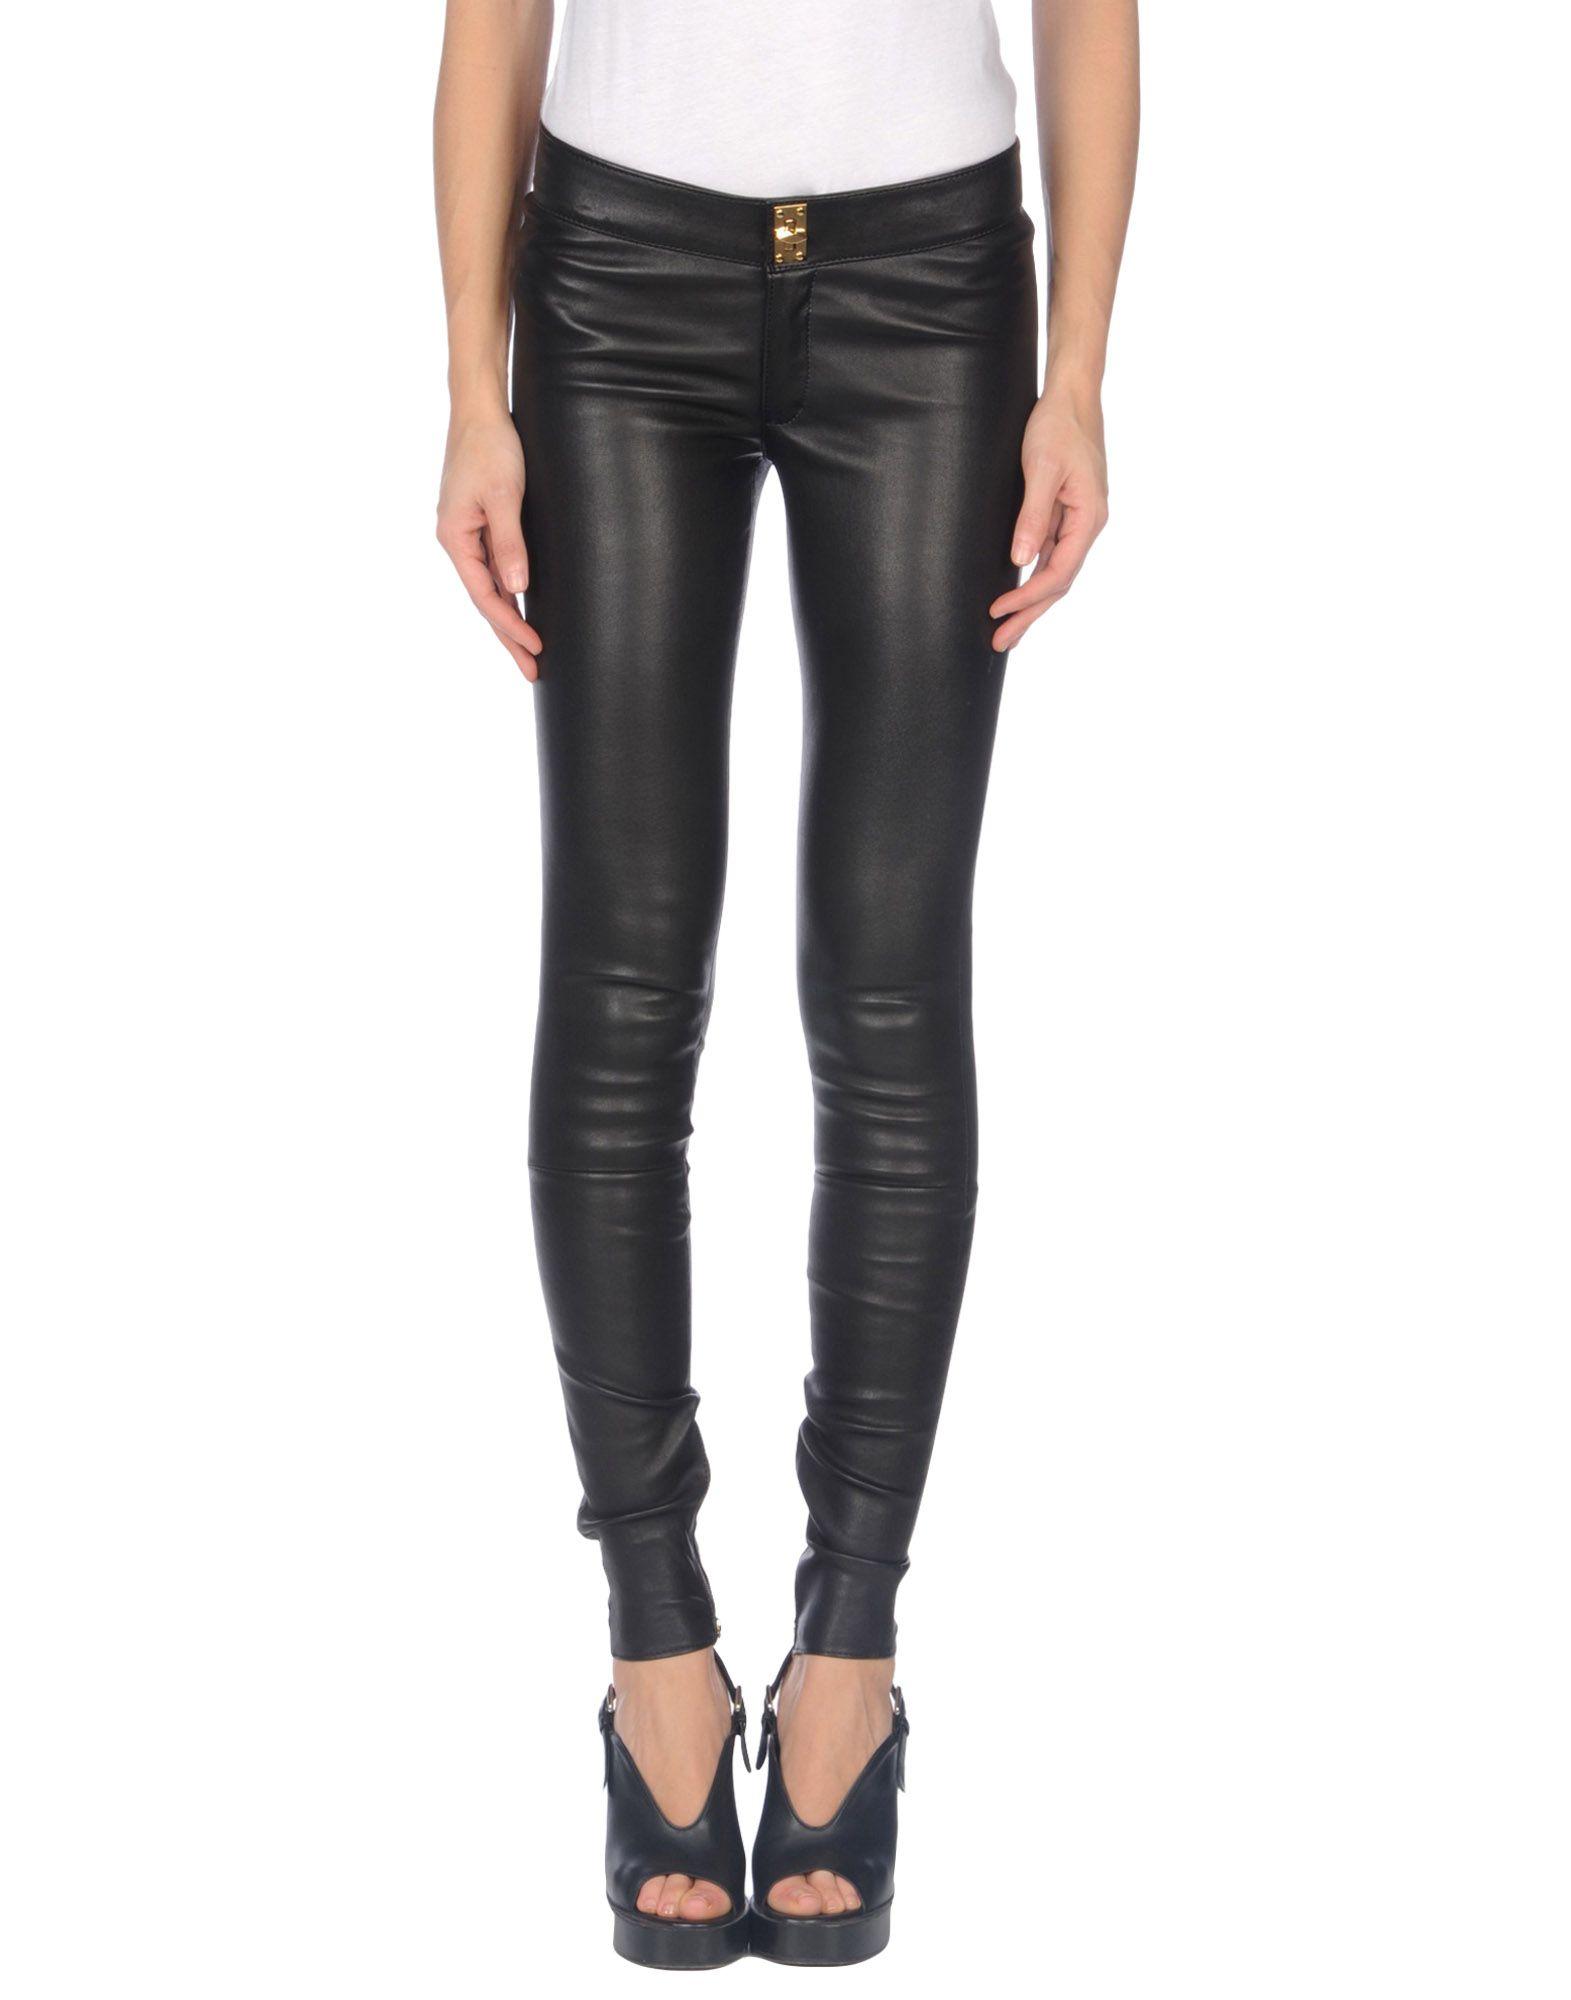 Pantalone Aphero Donna - Acquista online su tYK3p34